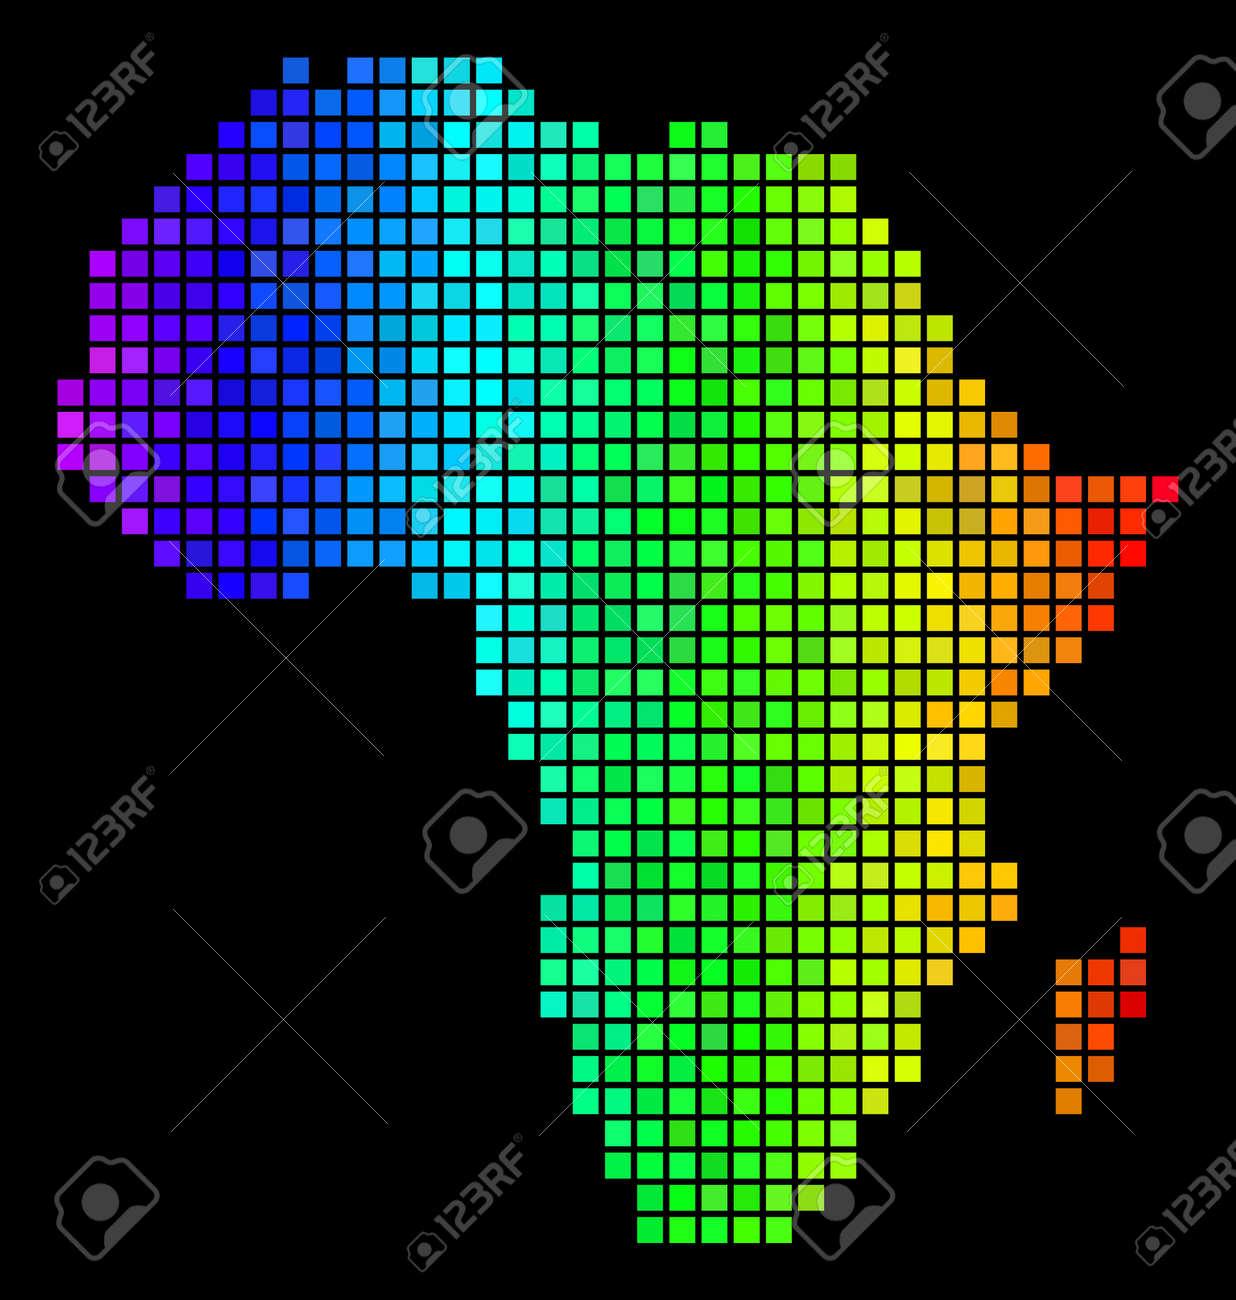 Digital Africa Map. Vector Territory Scheme In Glossy Spectrum